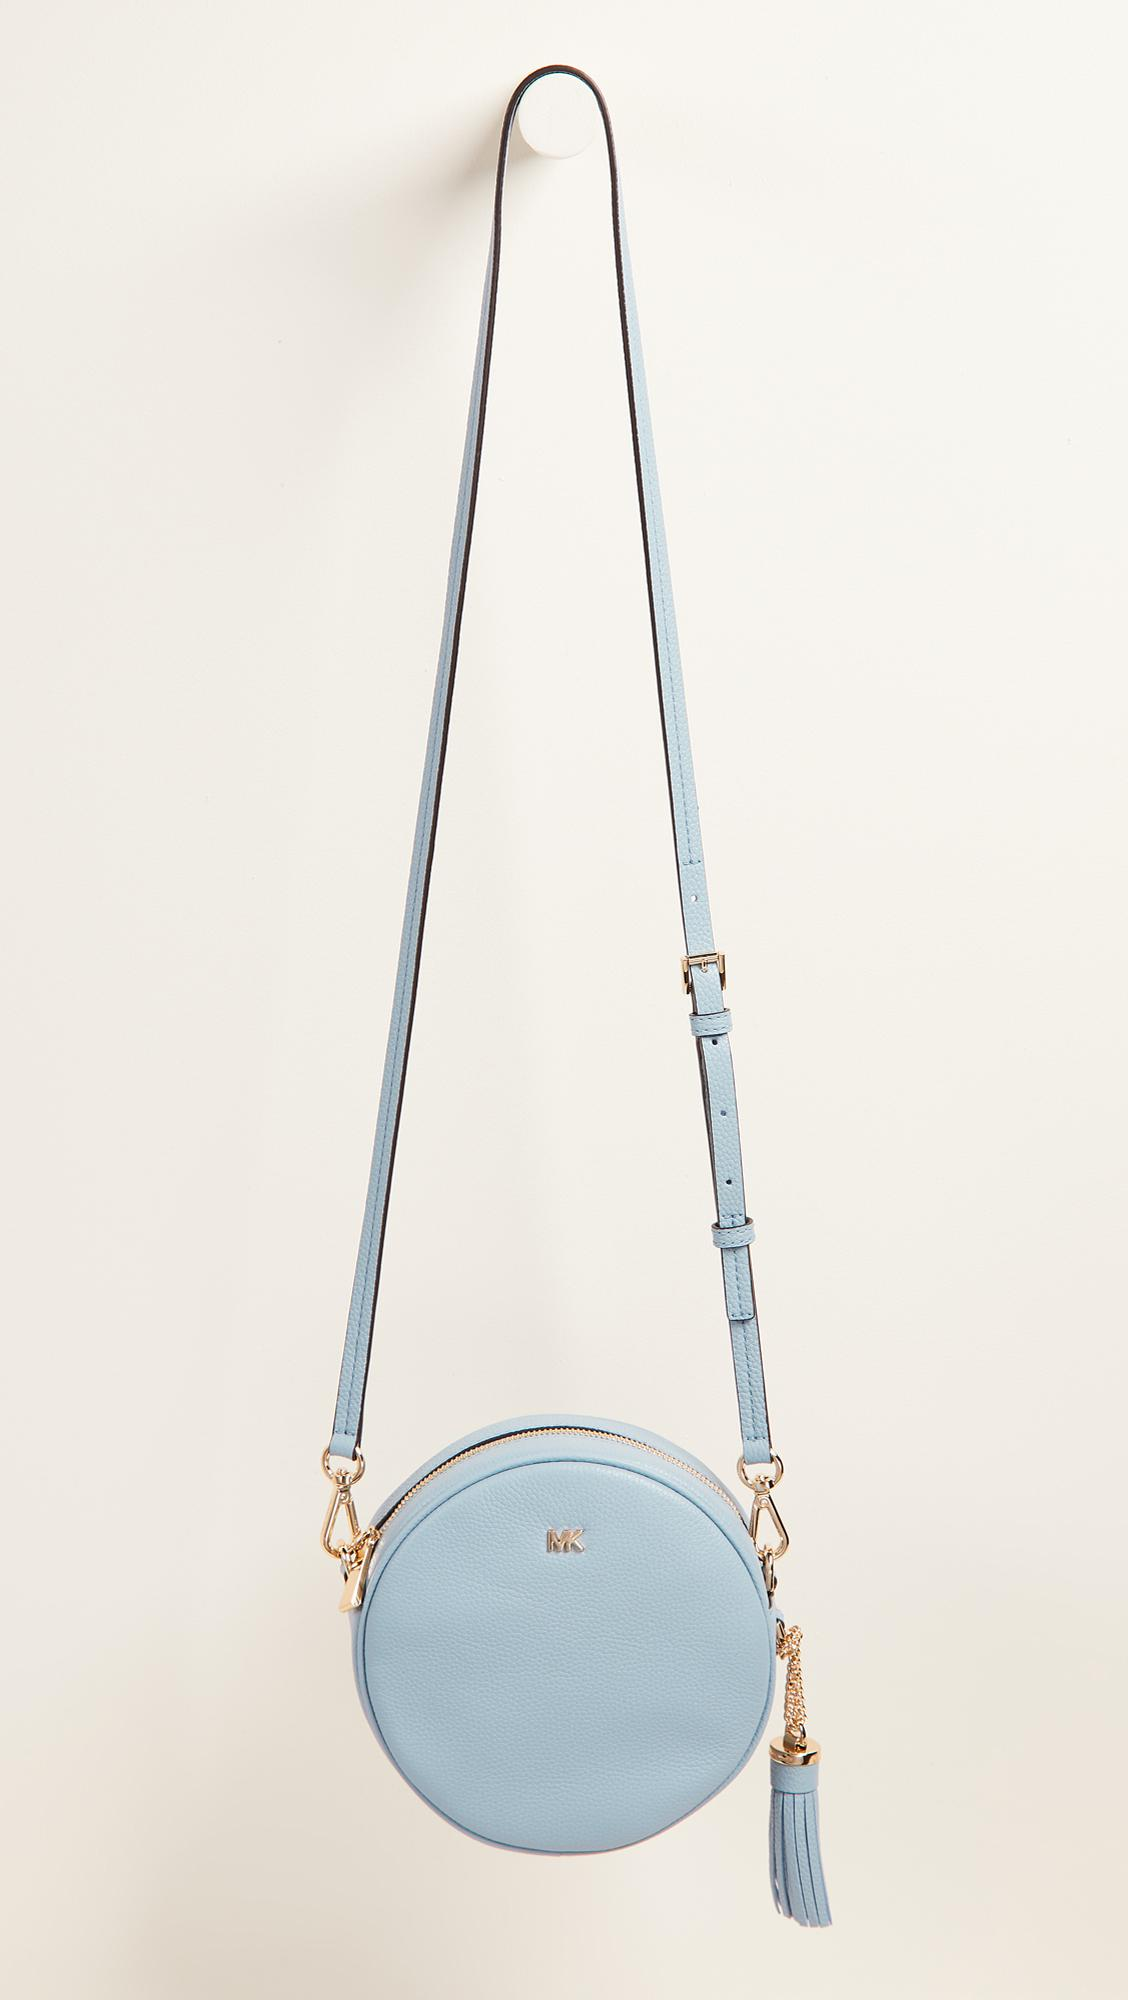 cc647a66cbbf MICHAEL Michael Kors Medium Canteen Cross Body Bag in Blue - Lyst